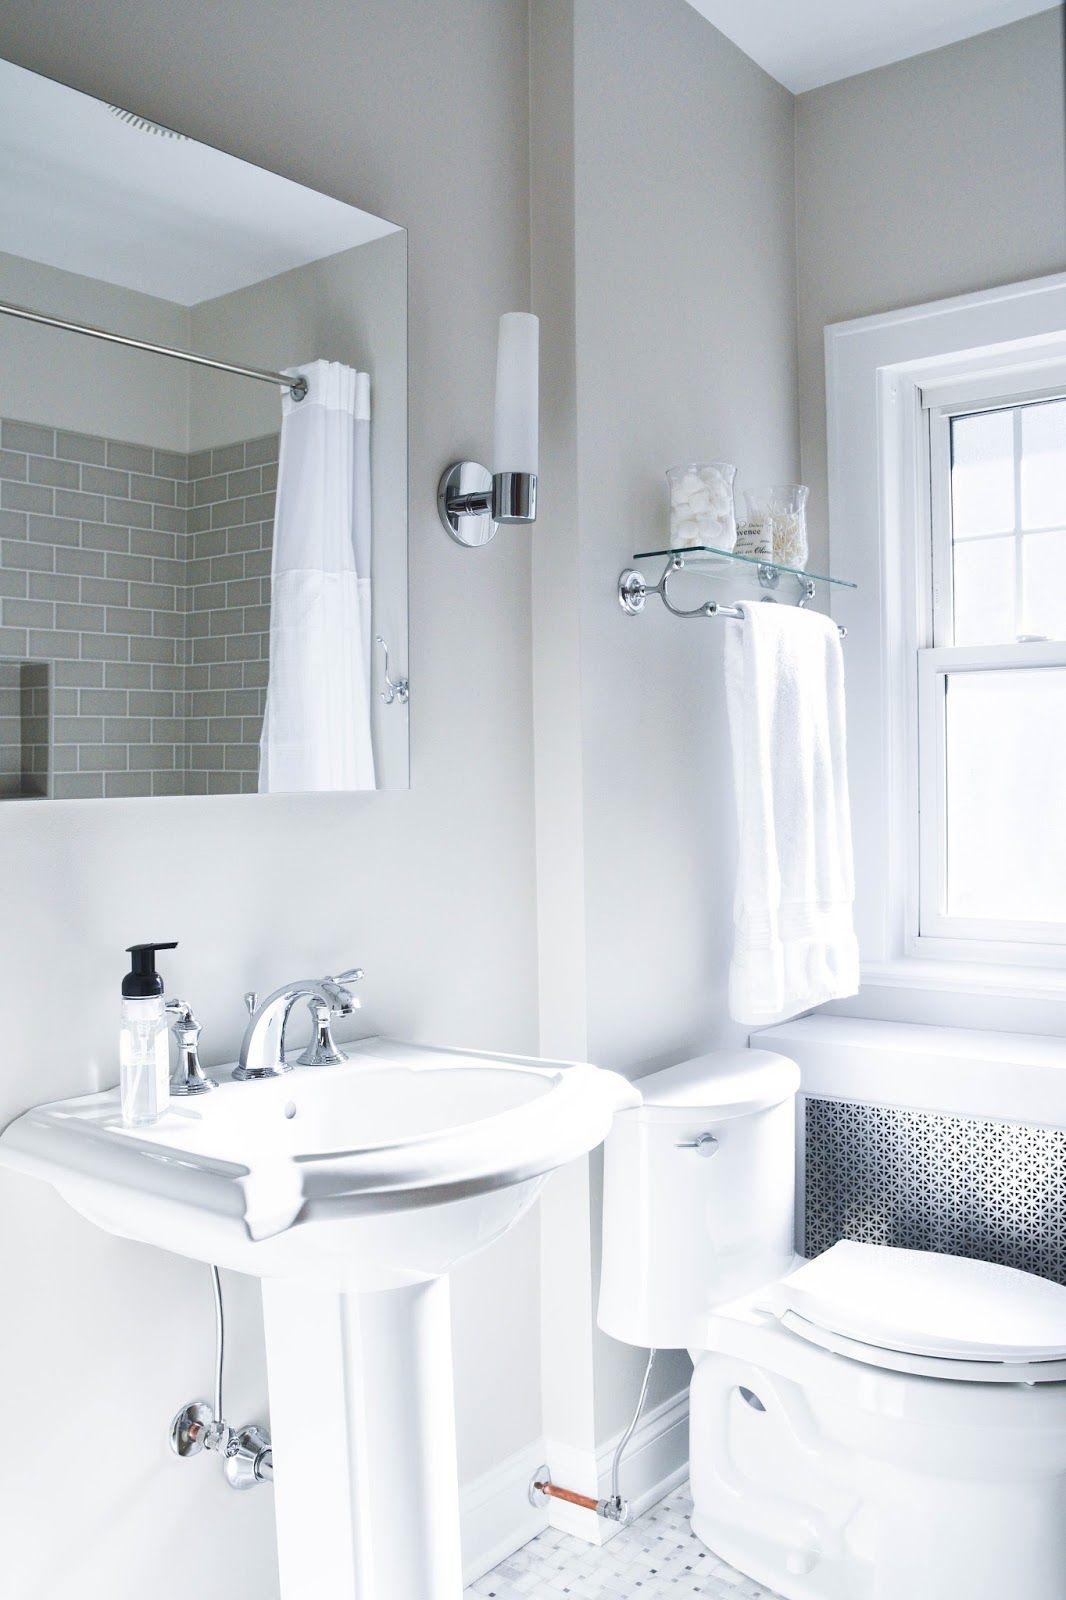 Bathroom Remodel Under $10,000 | Budget bathroom, Traditional and Modern